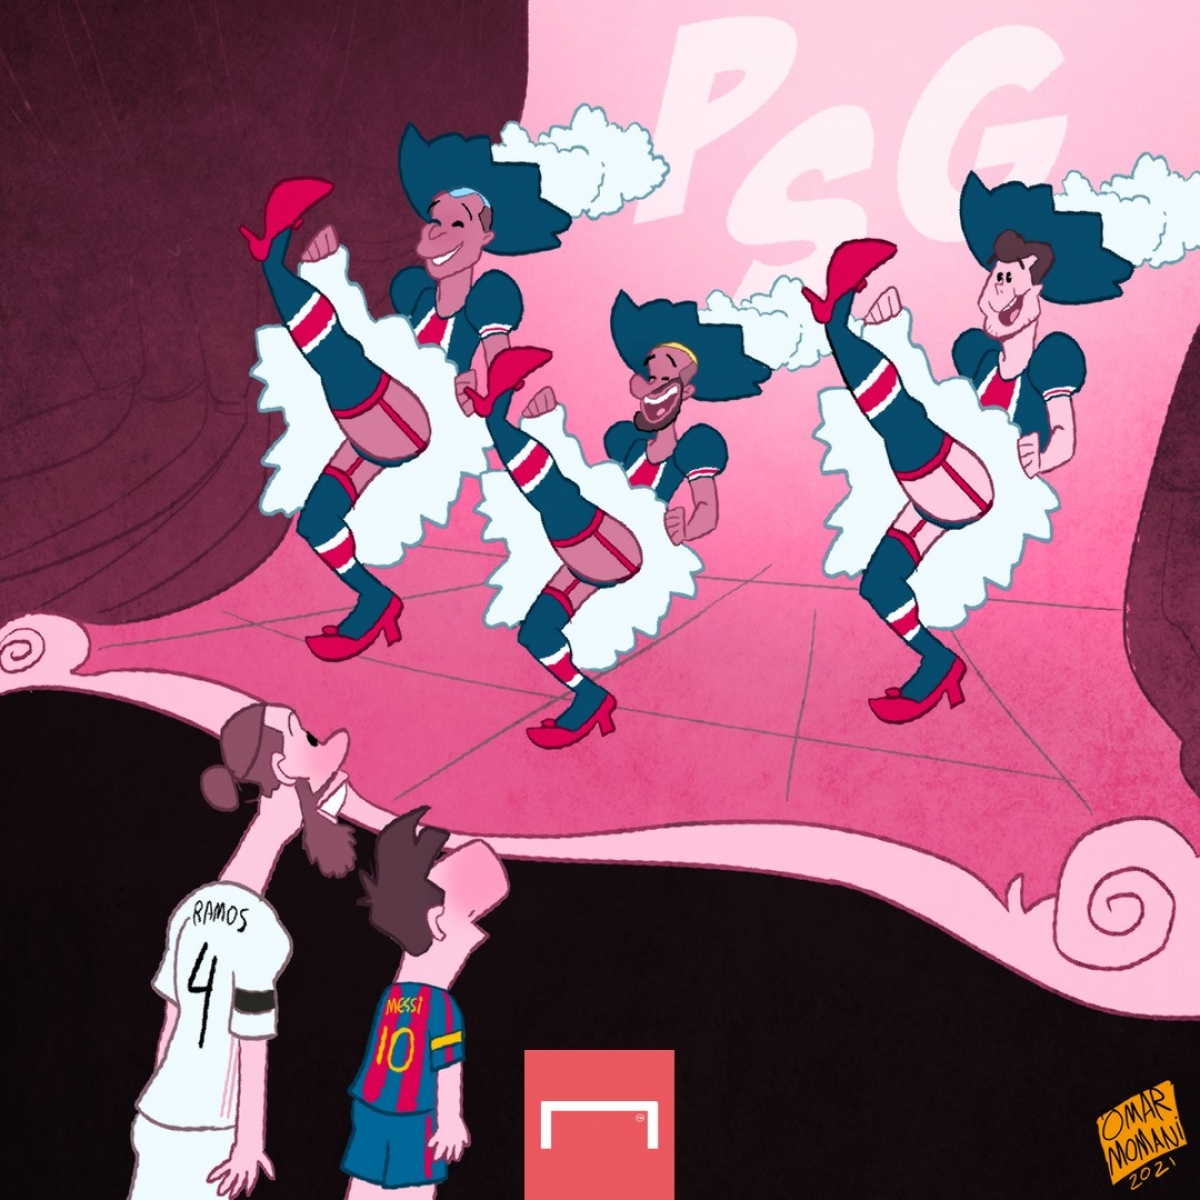 PSG mời gọi Sergio Ramos và Lionel Messi. (Ảnh: Omar Momani)